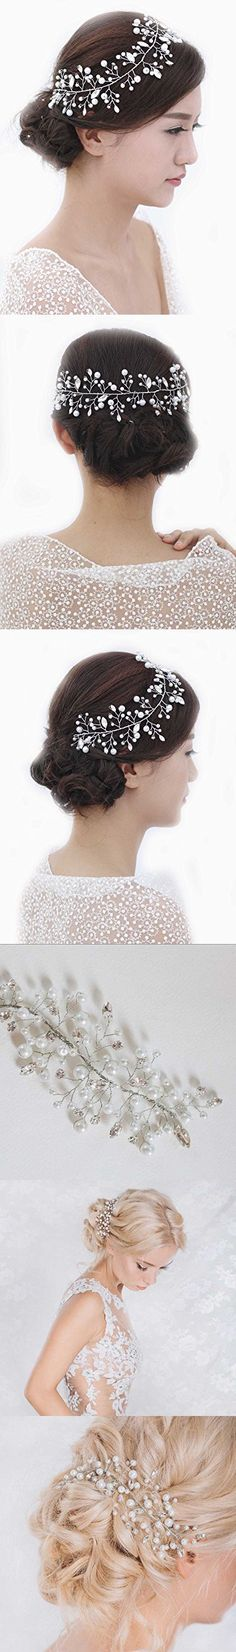 Venusvi Women's Alloy / Resin Headpiece-Wedding / Special Occasion Headbands / Head Chain